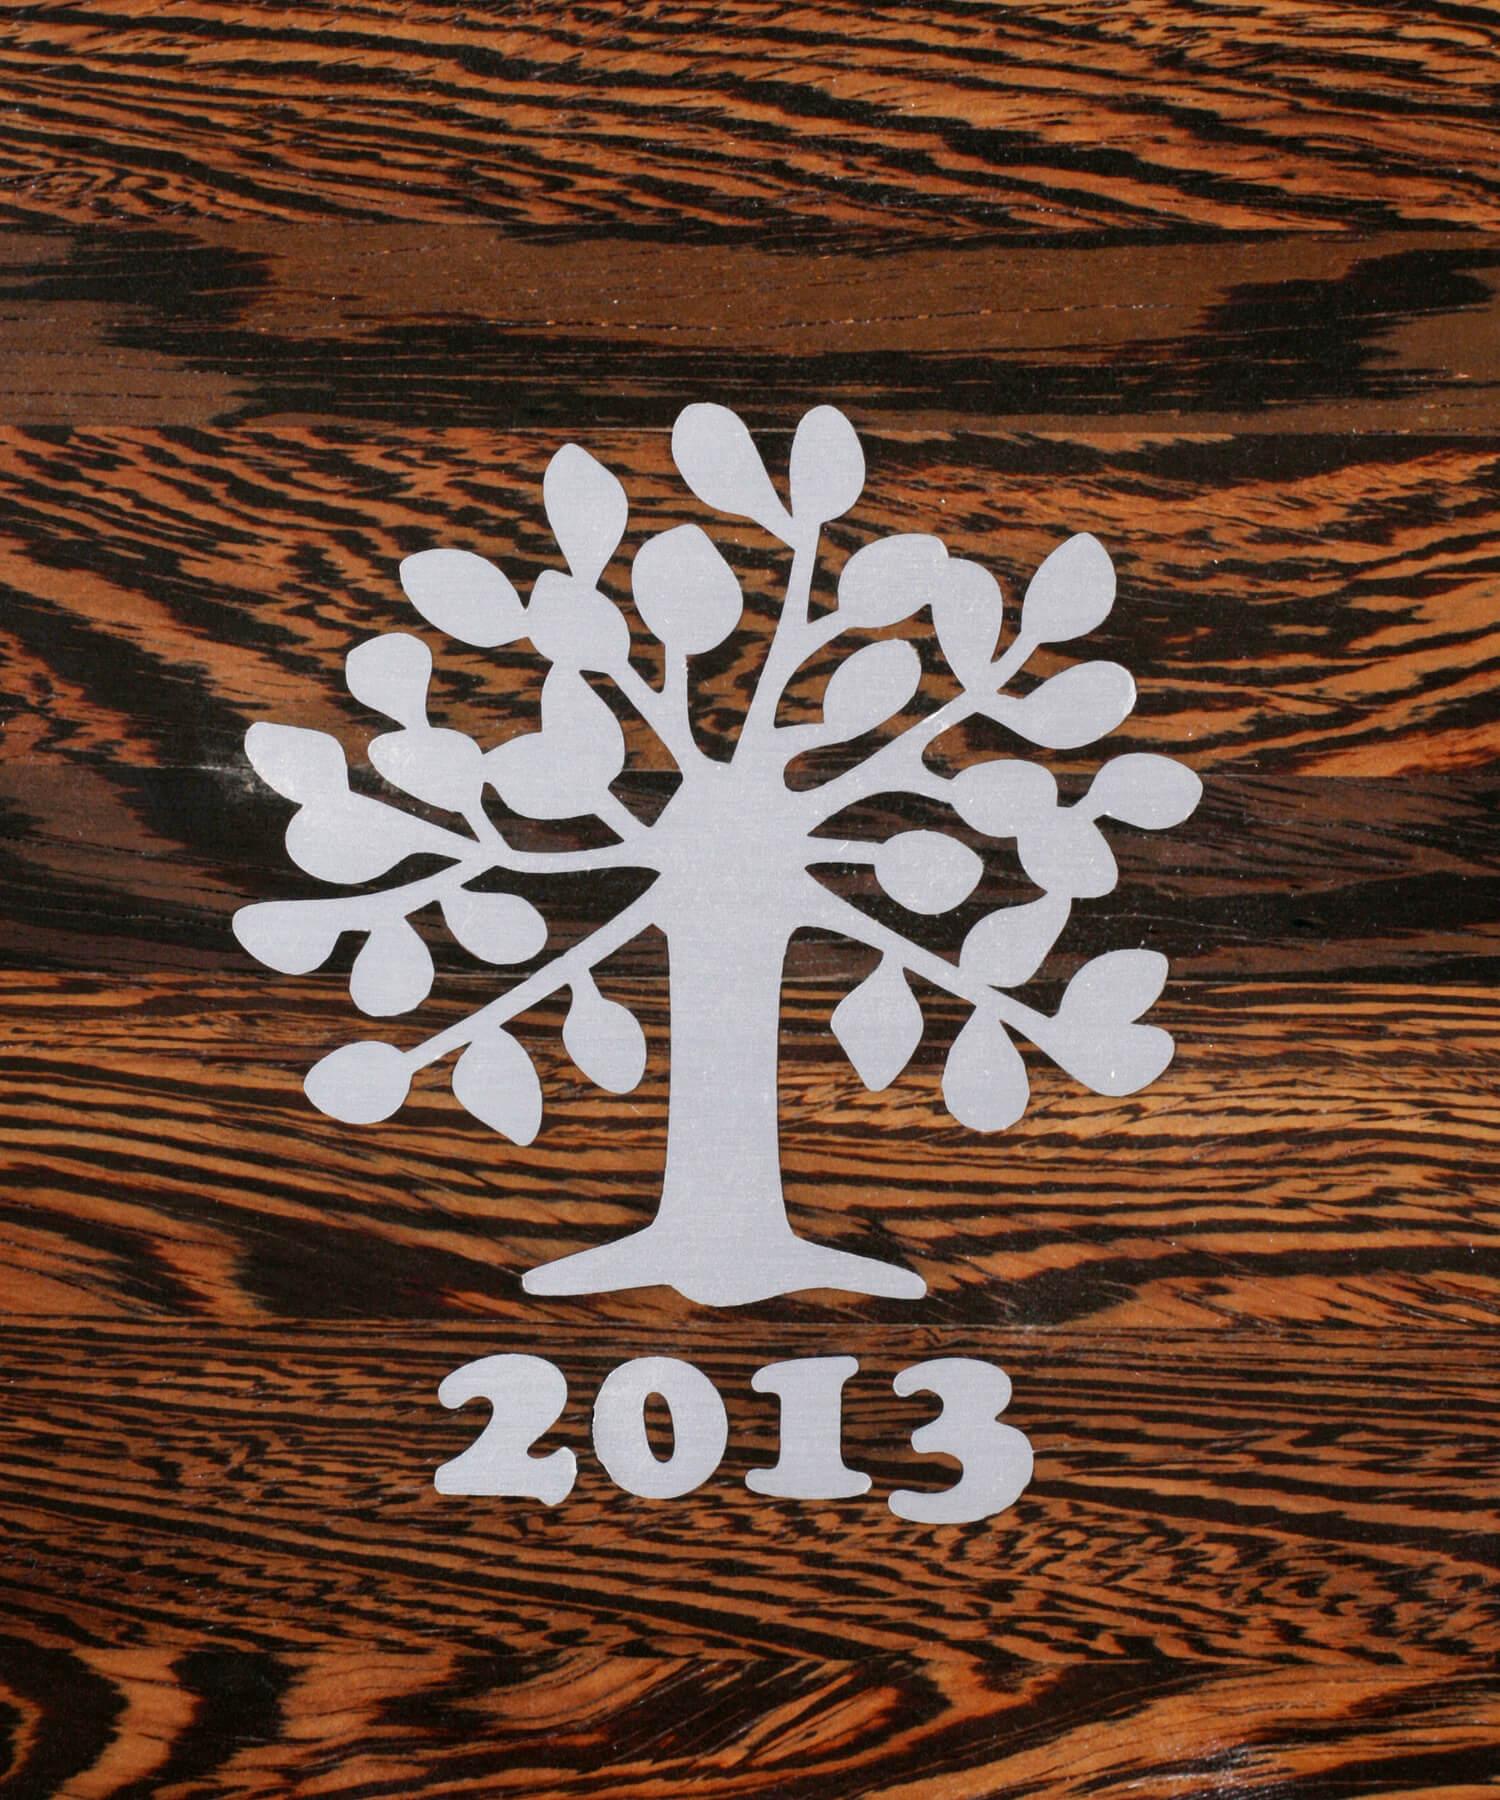 STREGER-Massivholztreppen-Intarsien-baum-2013